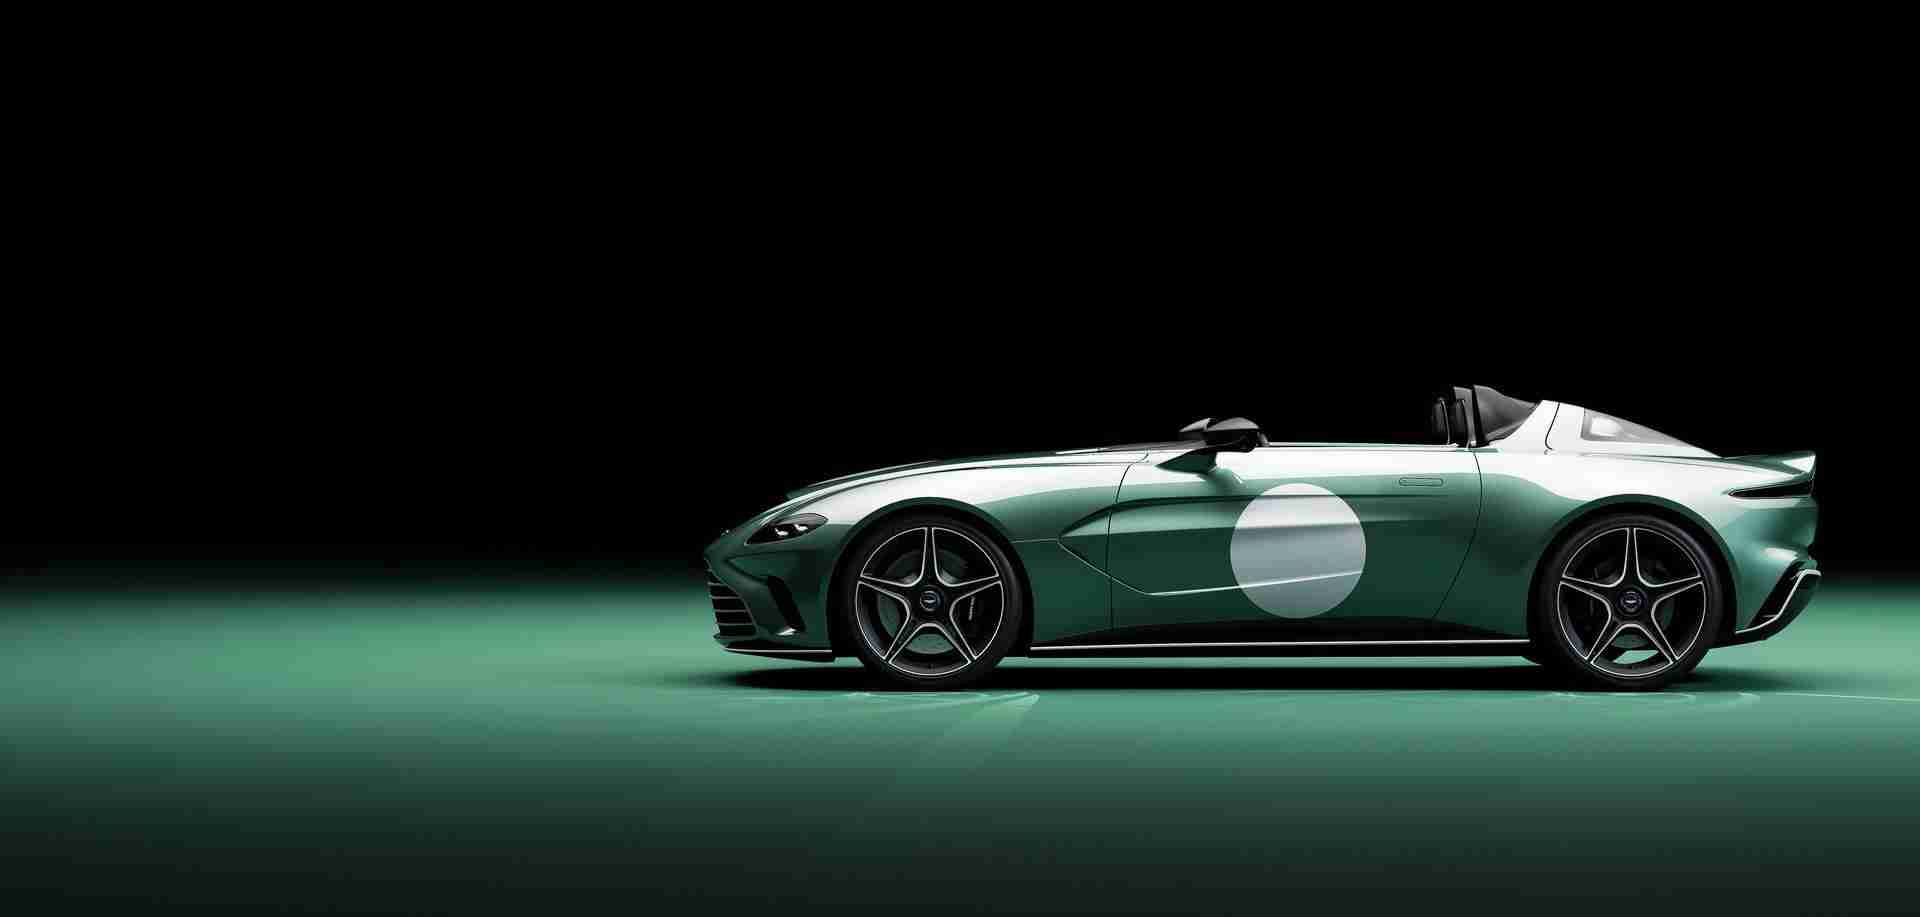 Aston_Martin_V12_Speedster_DBR1_Pack-0003